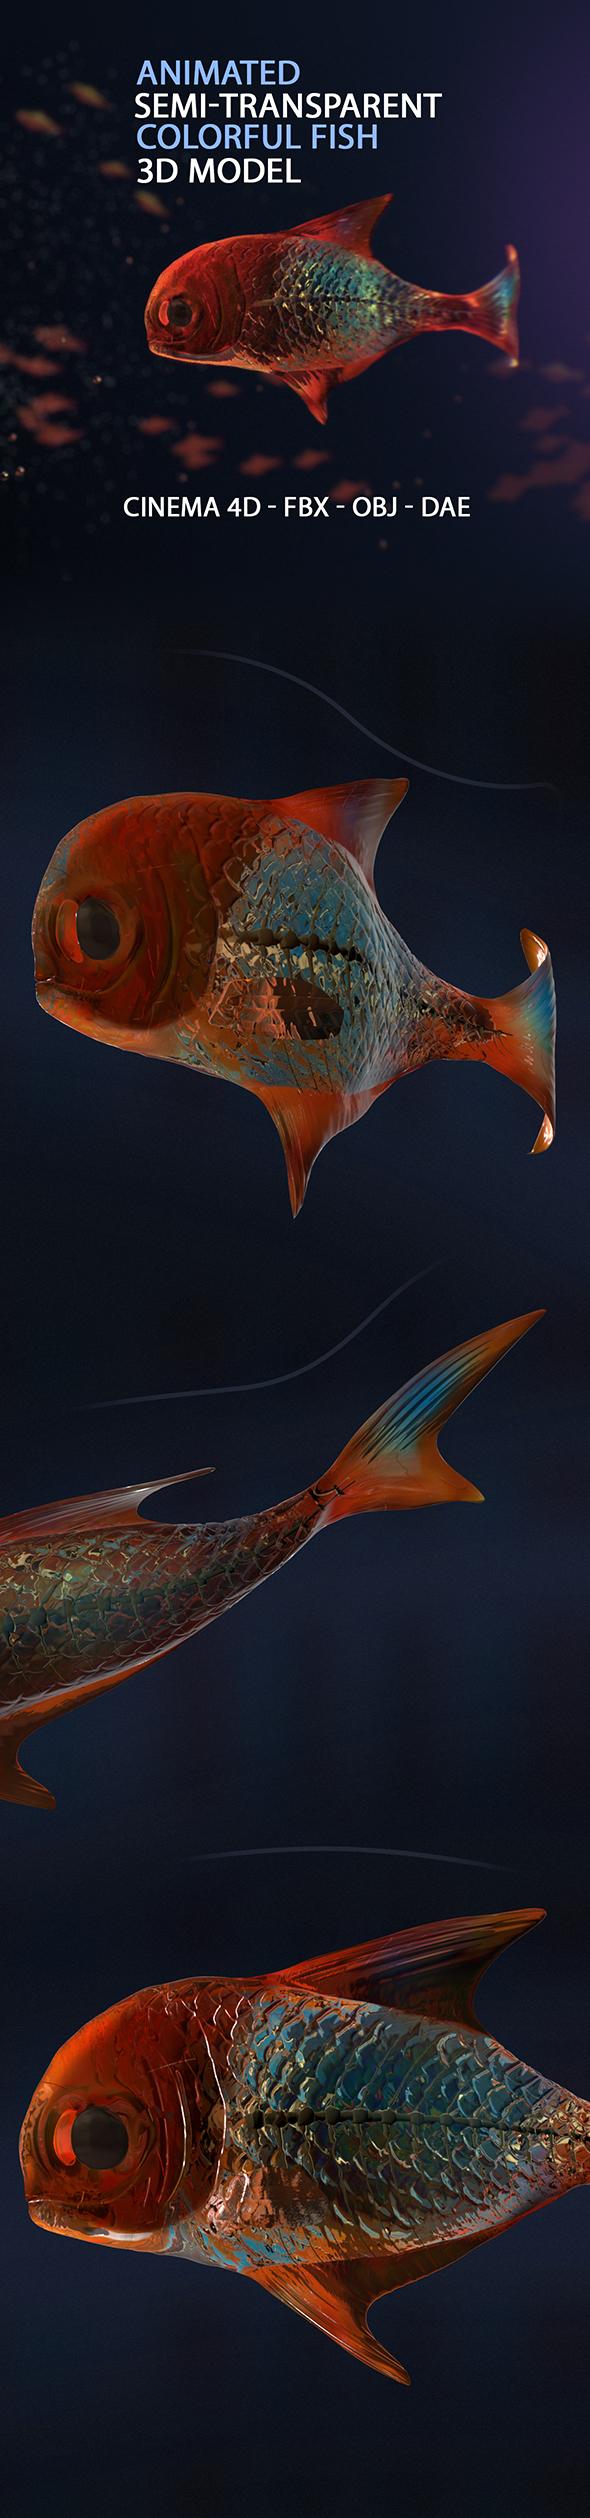 Animate Semi-transparent Fish Model - 3DOcean Item for Sale